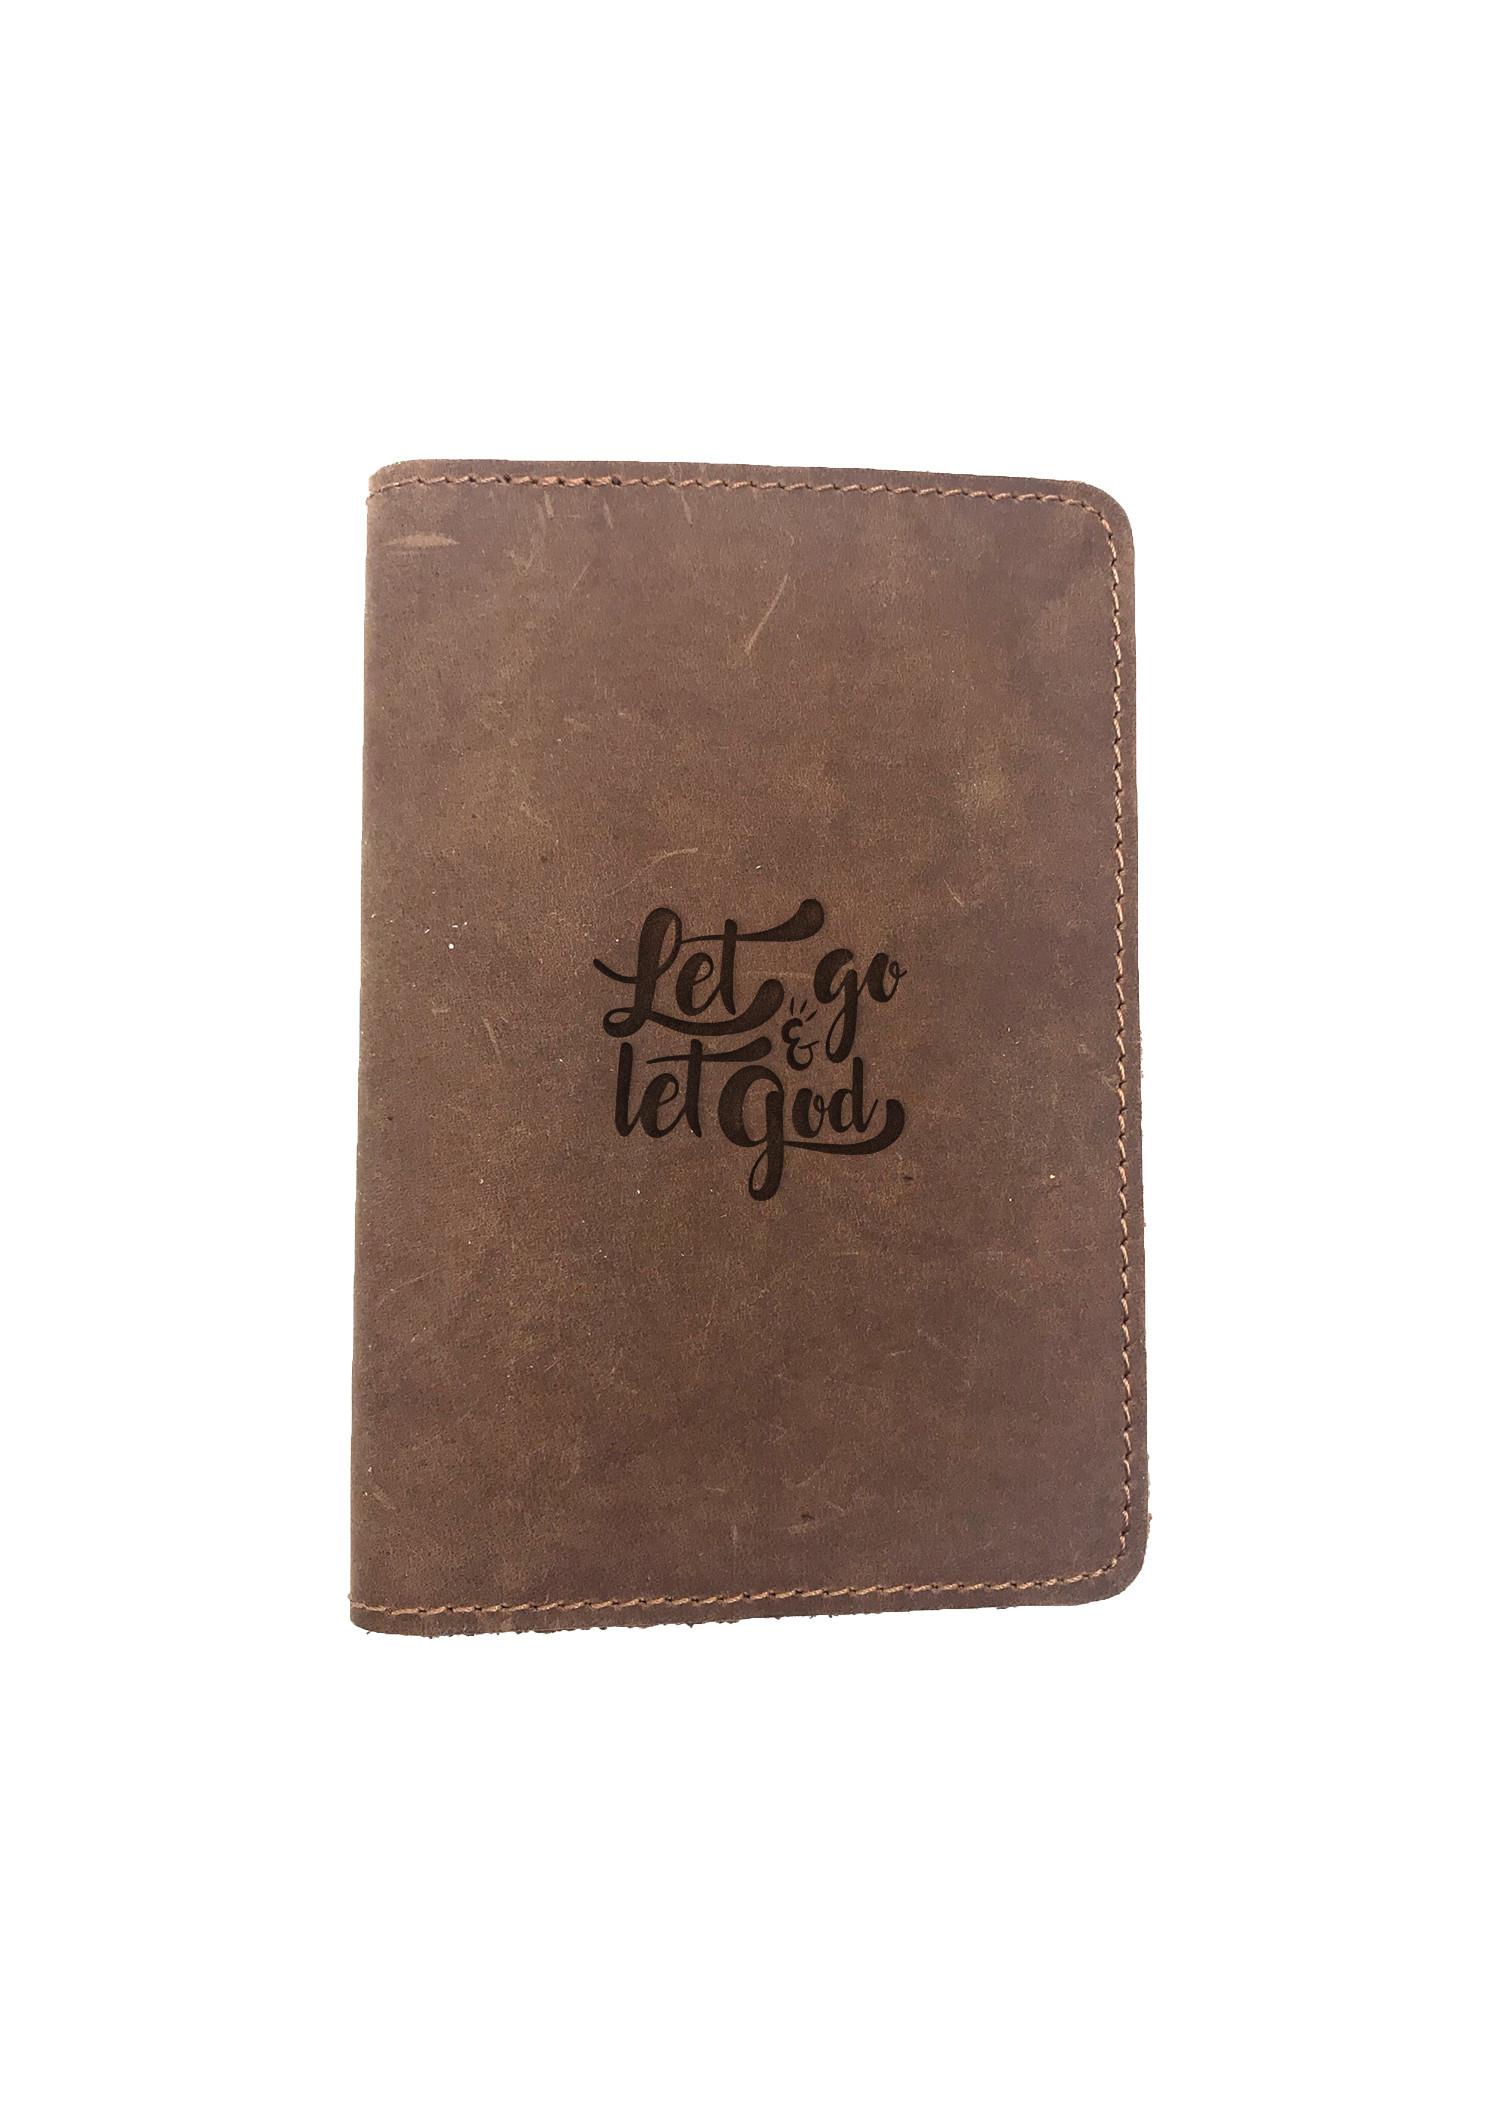 Passport Cover Bao Da Hộ Chiếu Da Sáp Khắc Hình Chữ CHRISTIAN LET GO LET GOD (BROWN)